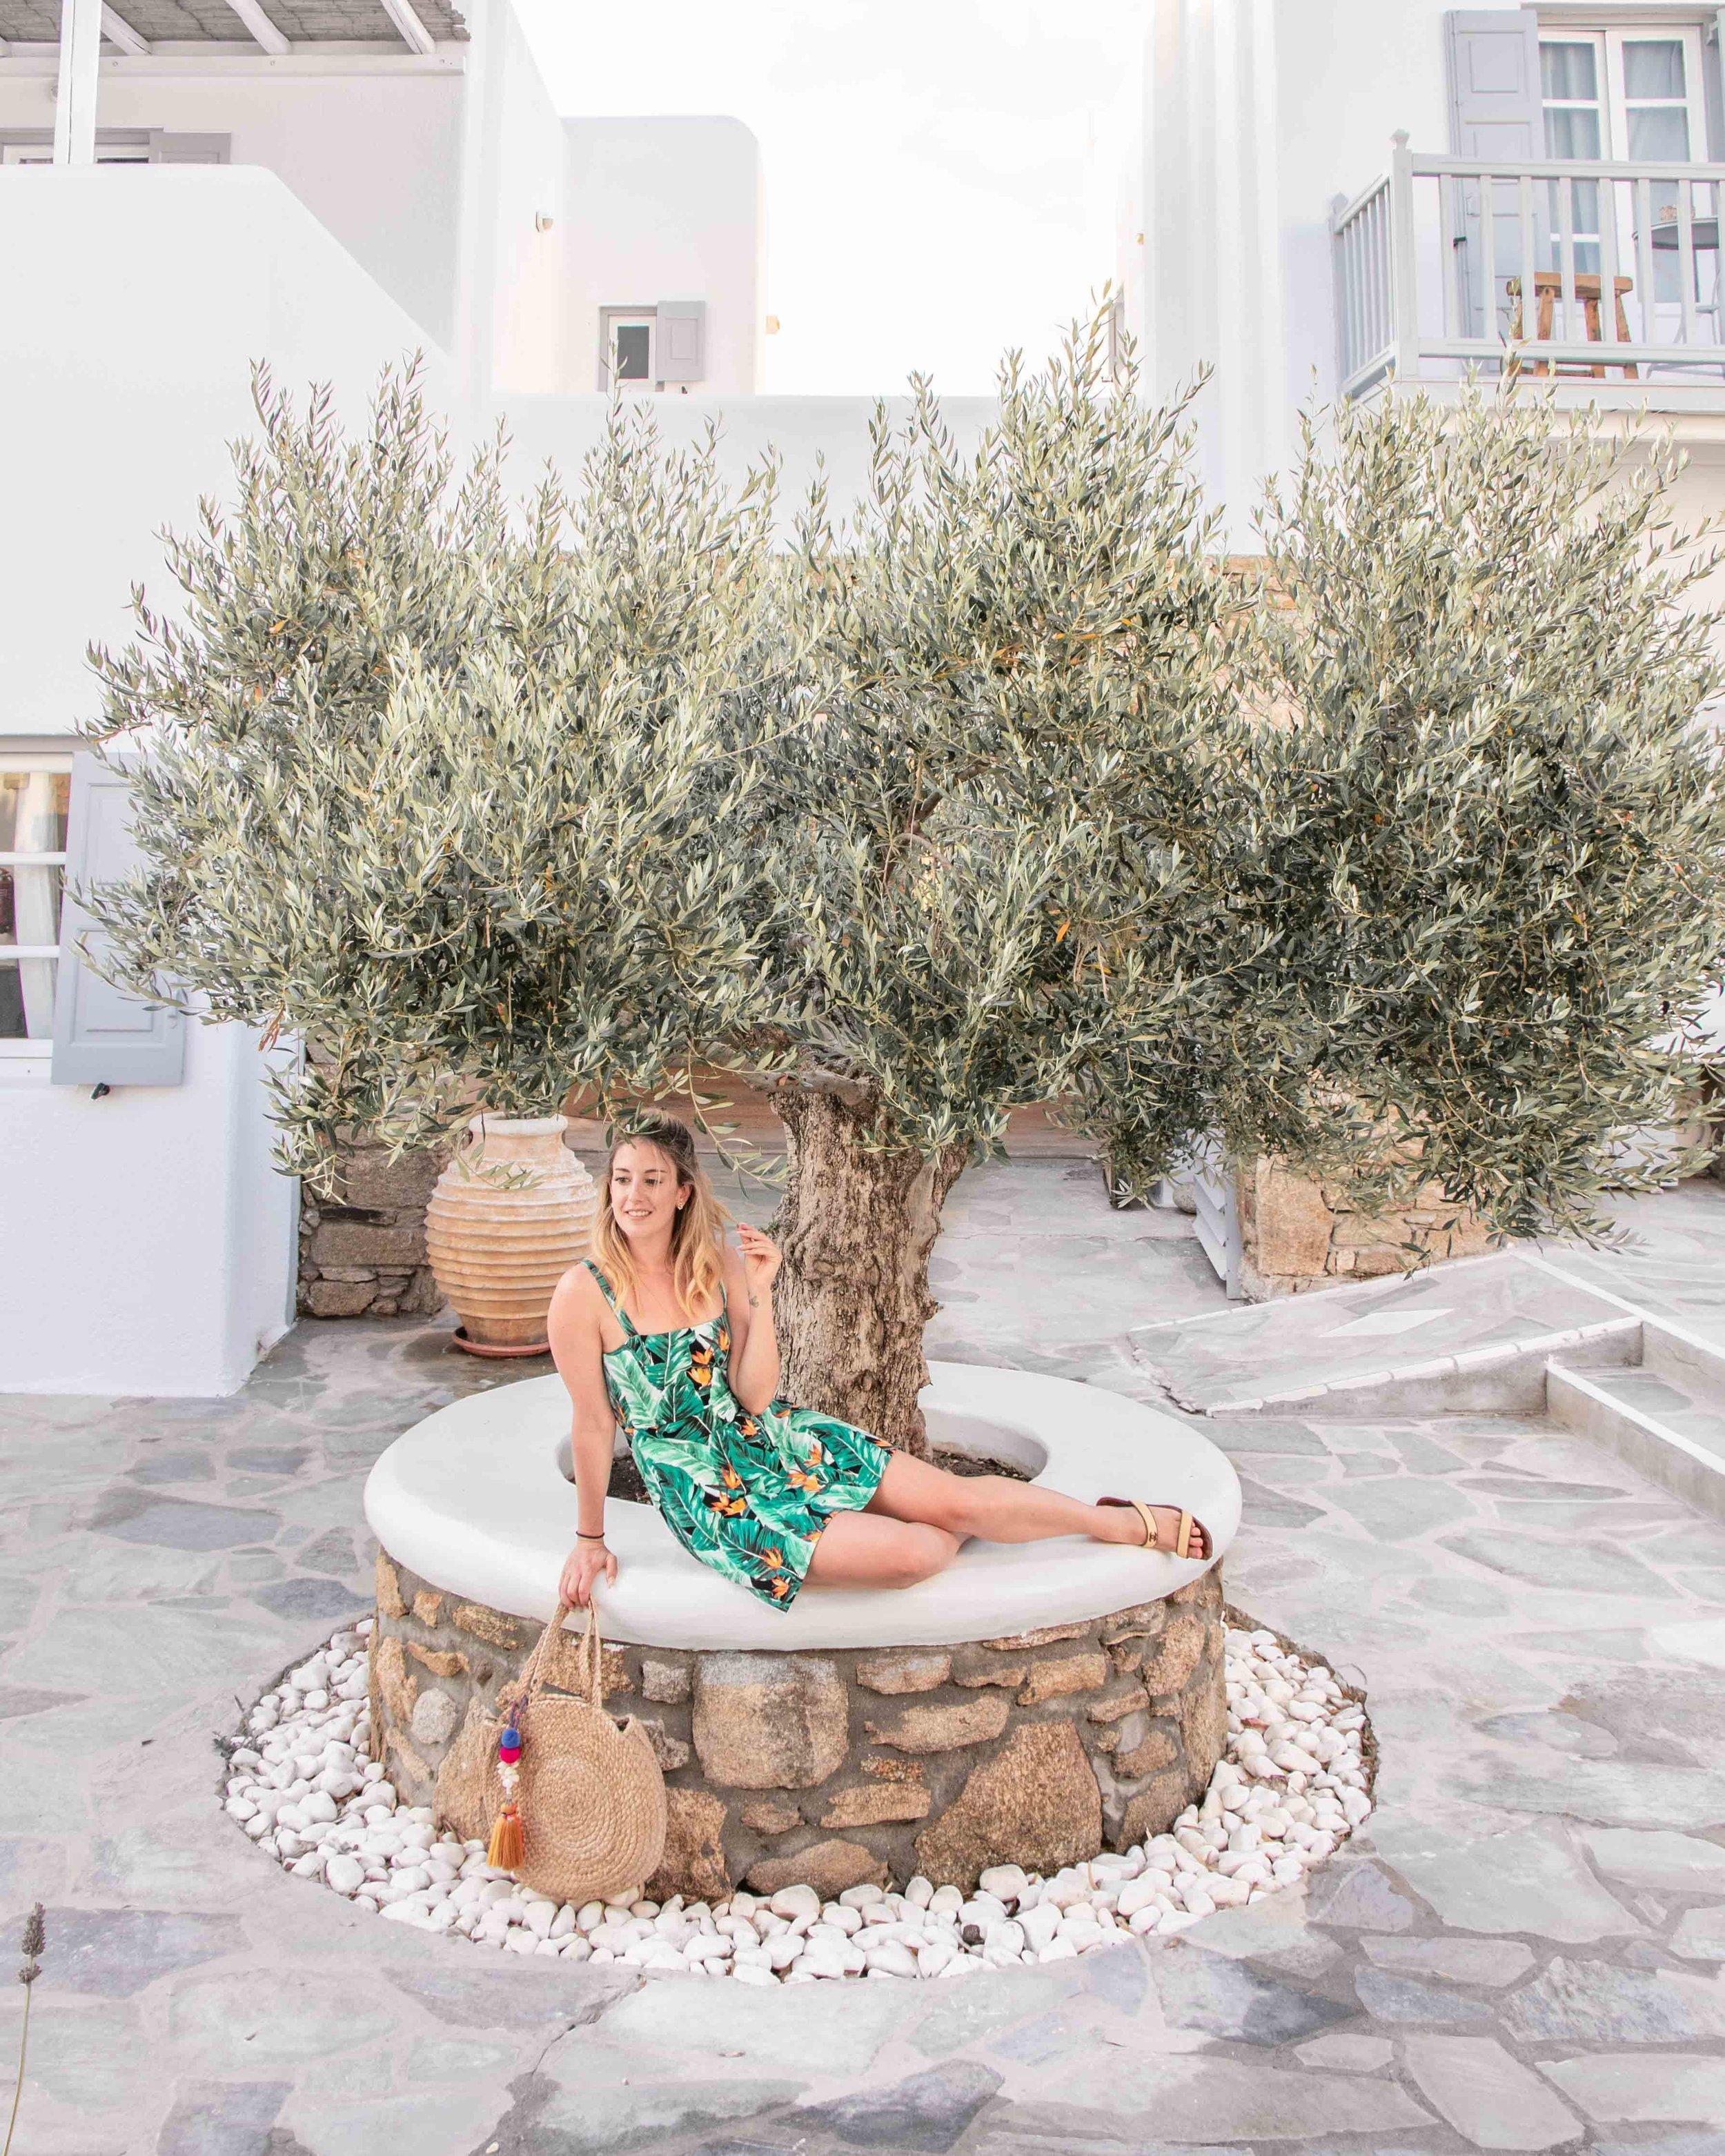 Olive tree at my hotel -  San Giorgio Mykonos